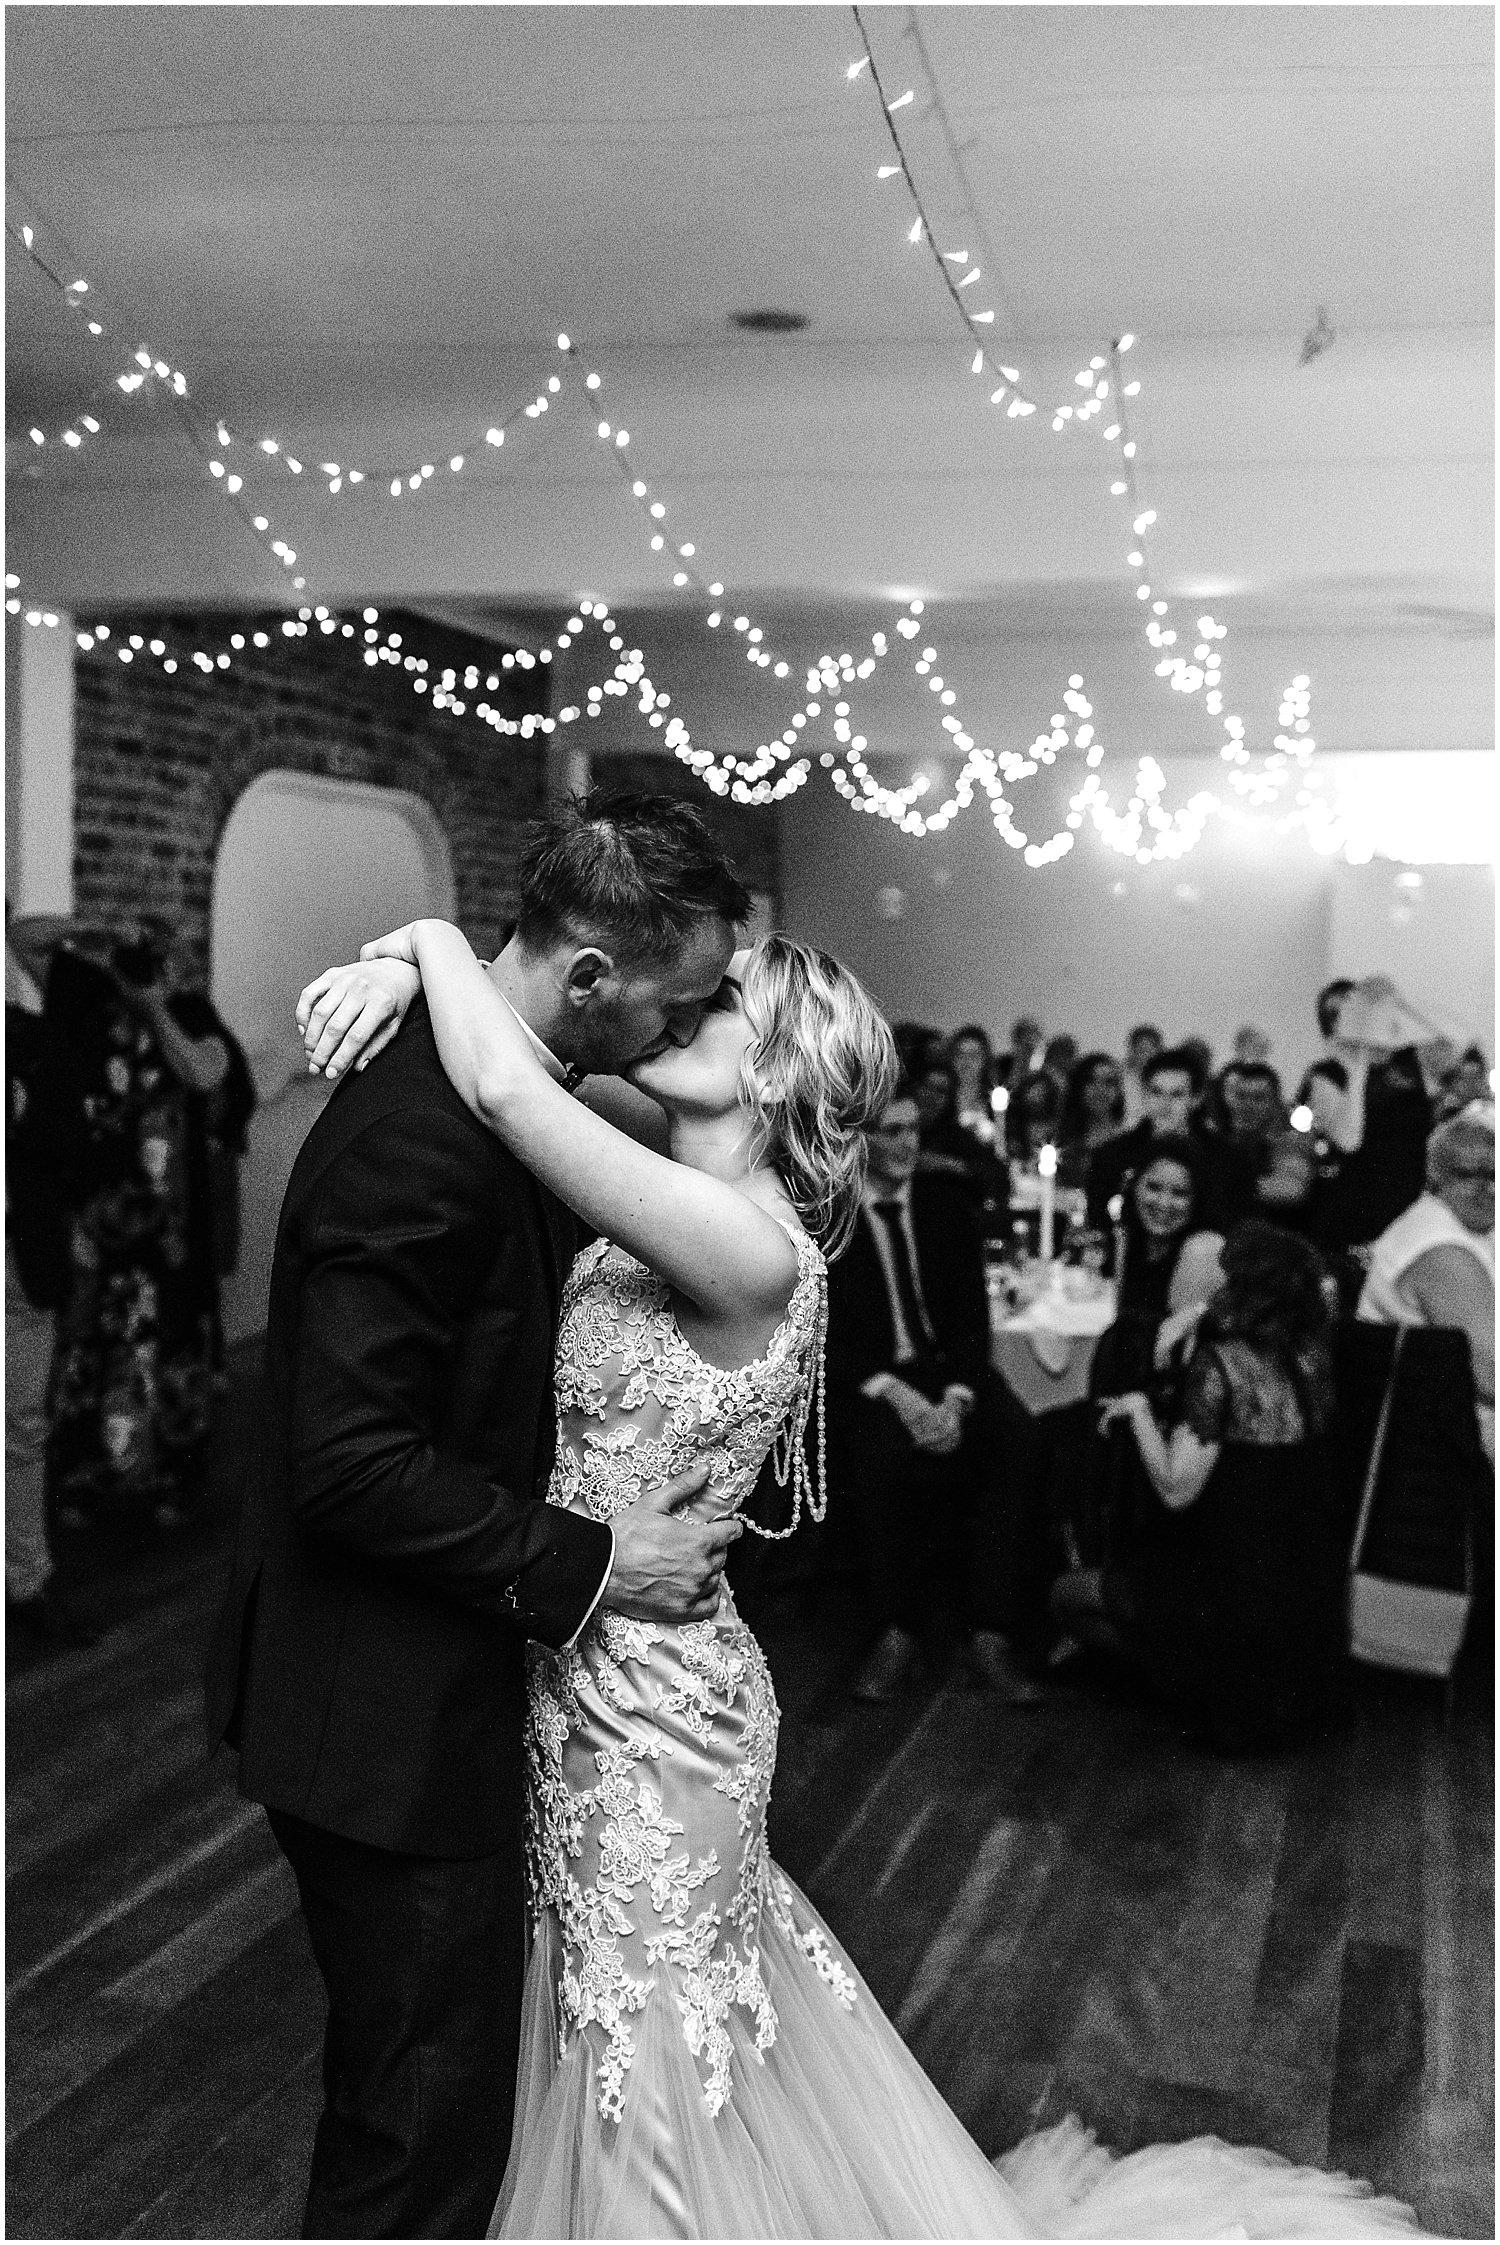 dominique-guy-montrose-berry-farm-wedding-_0095.jpg